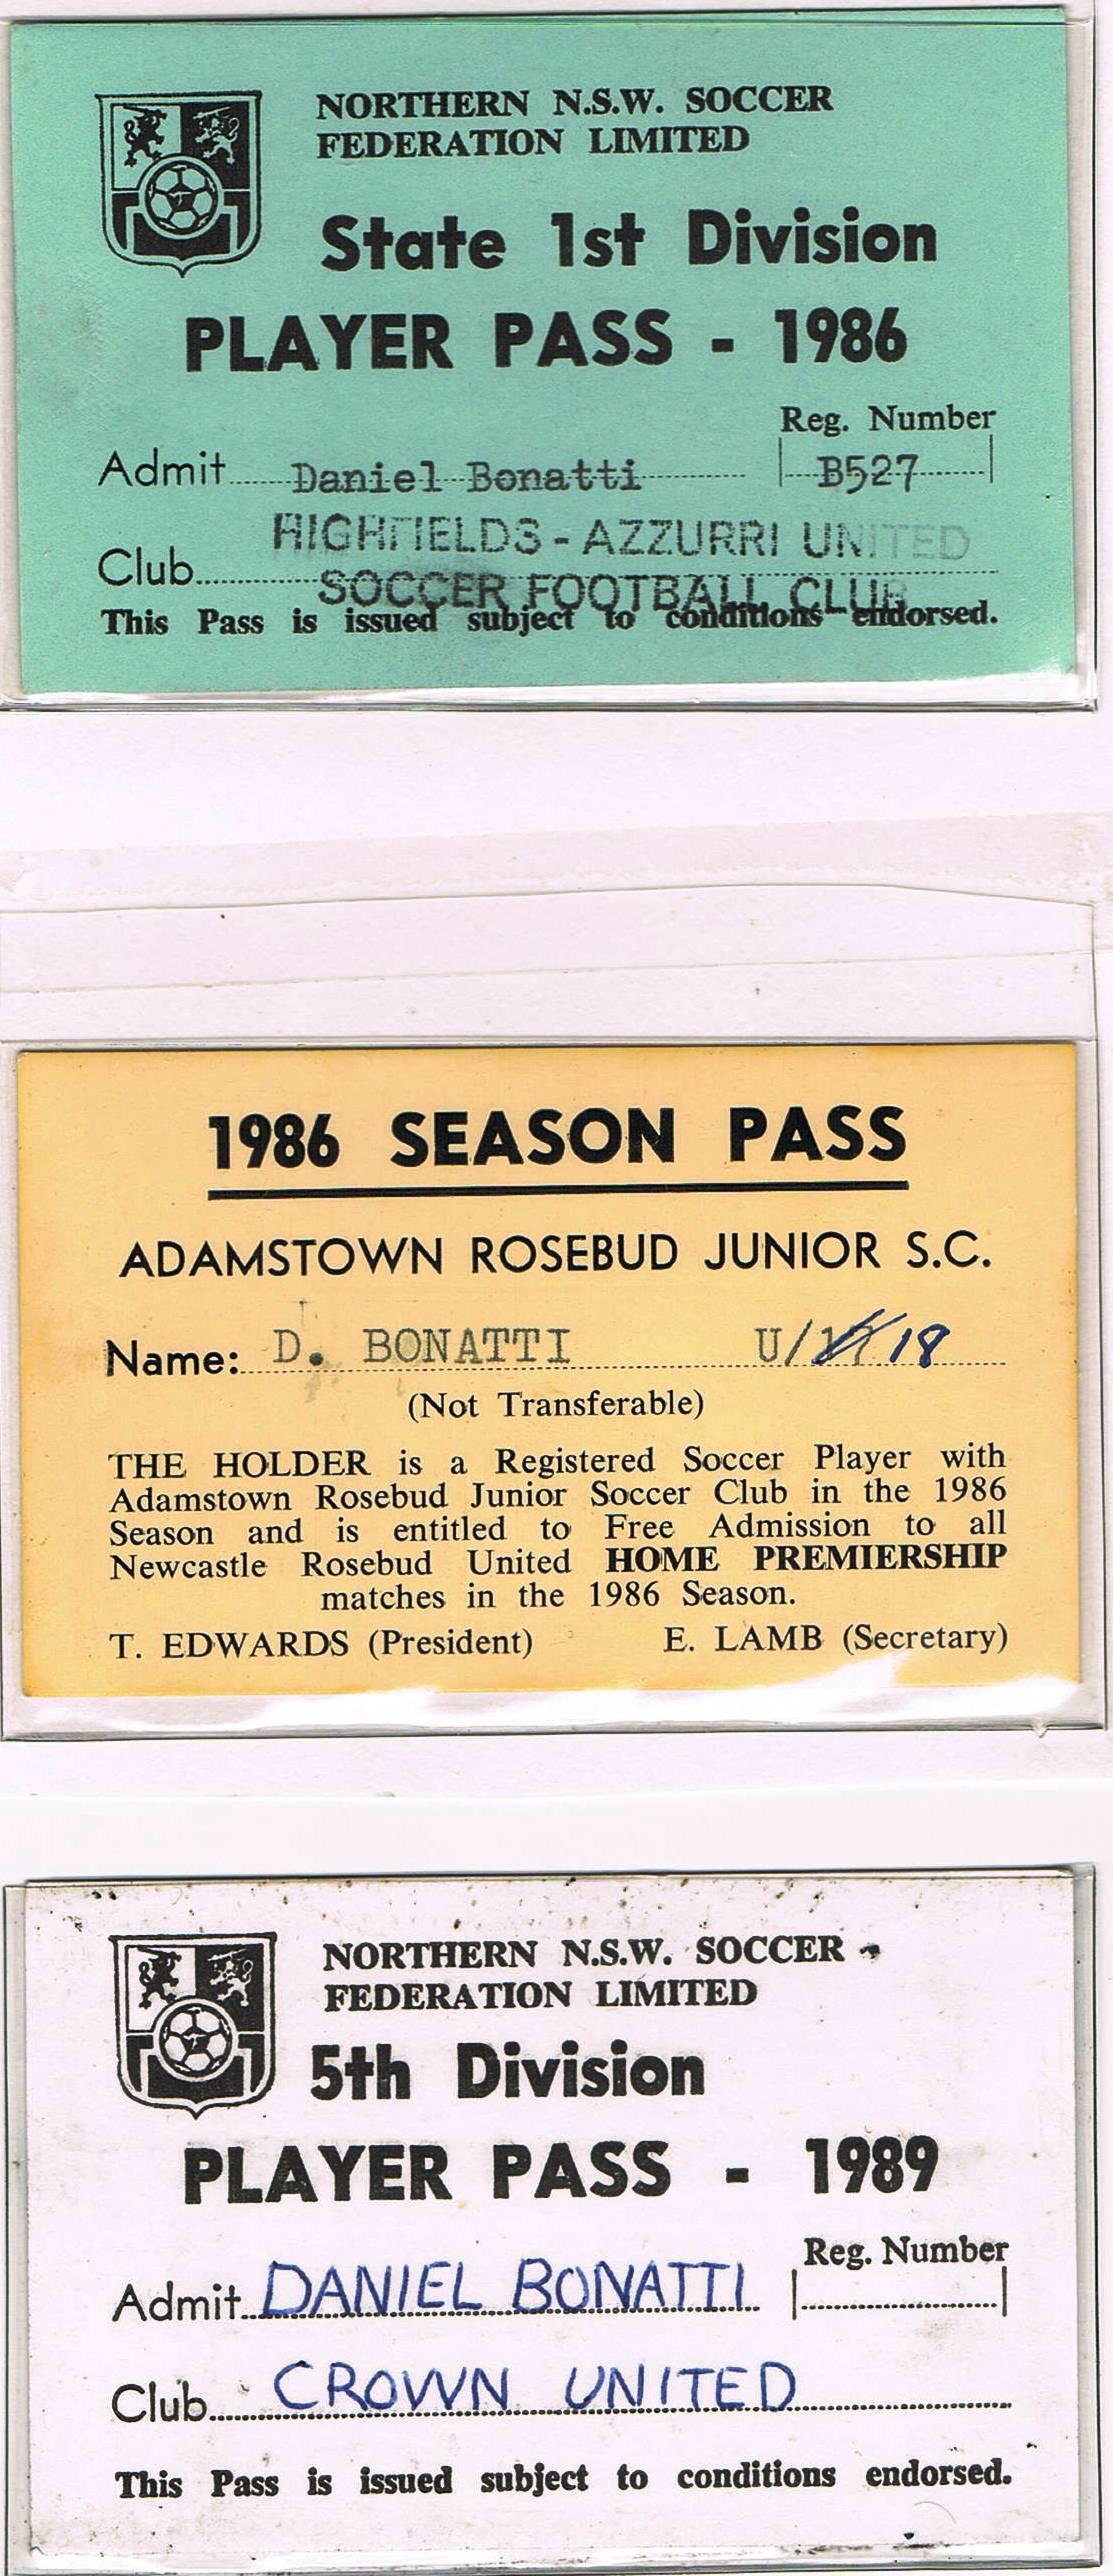 Player Passes